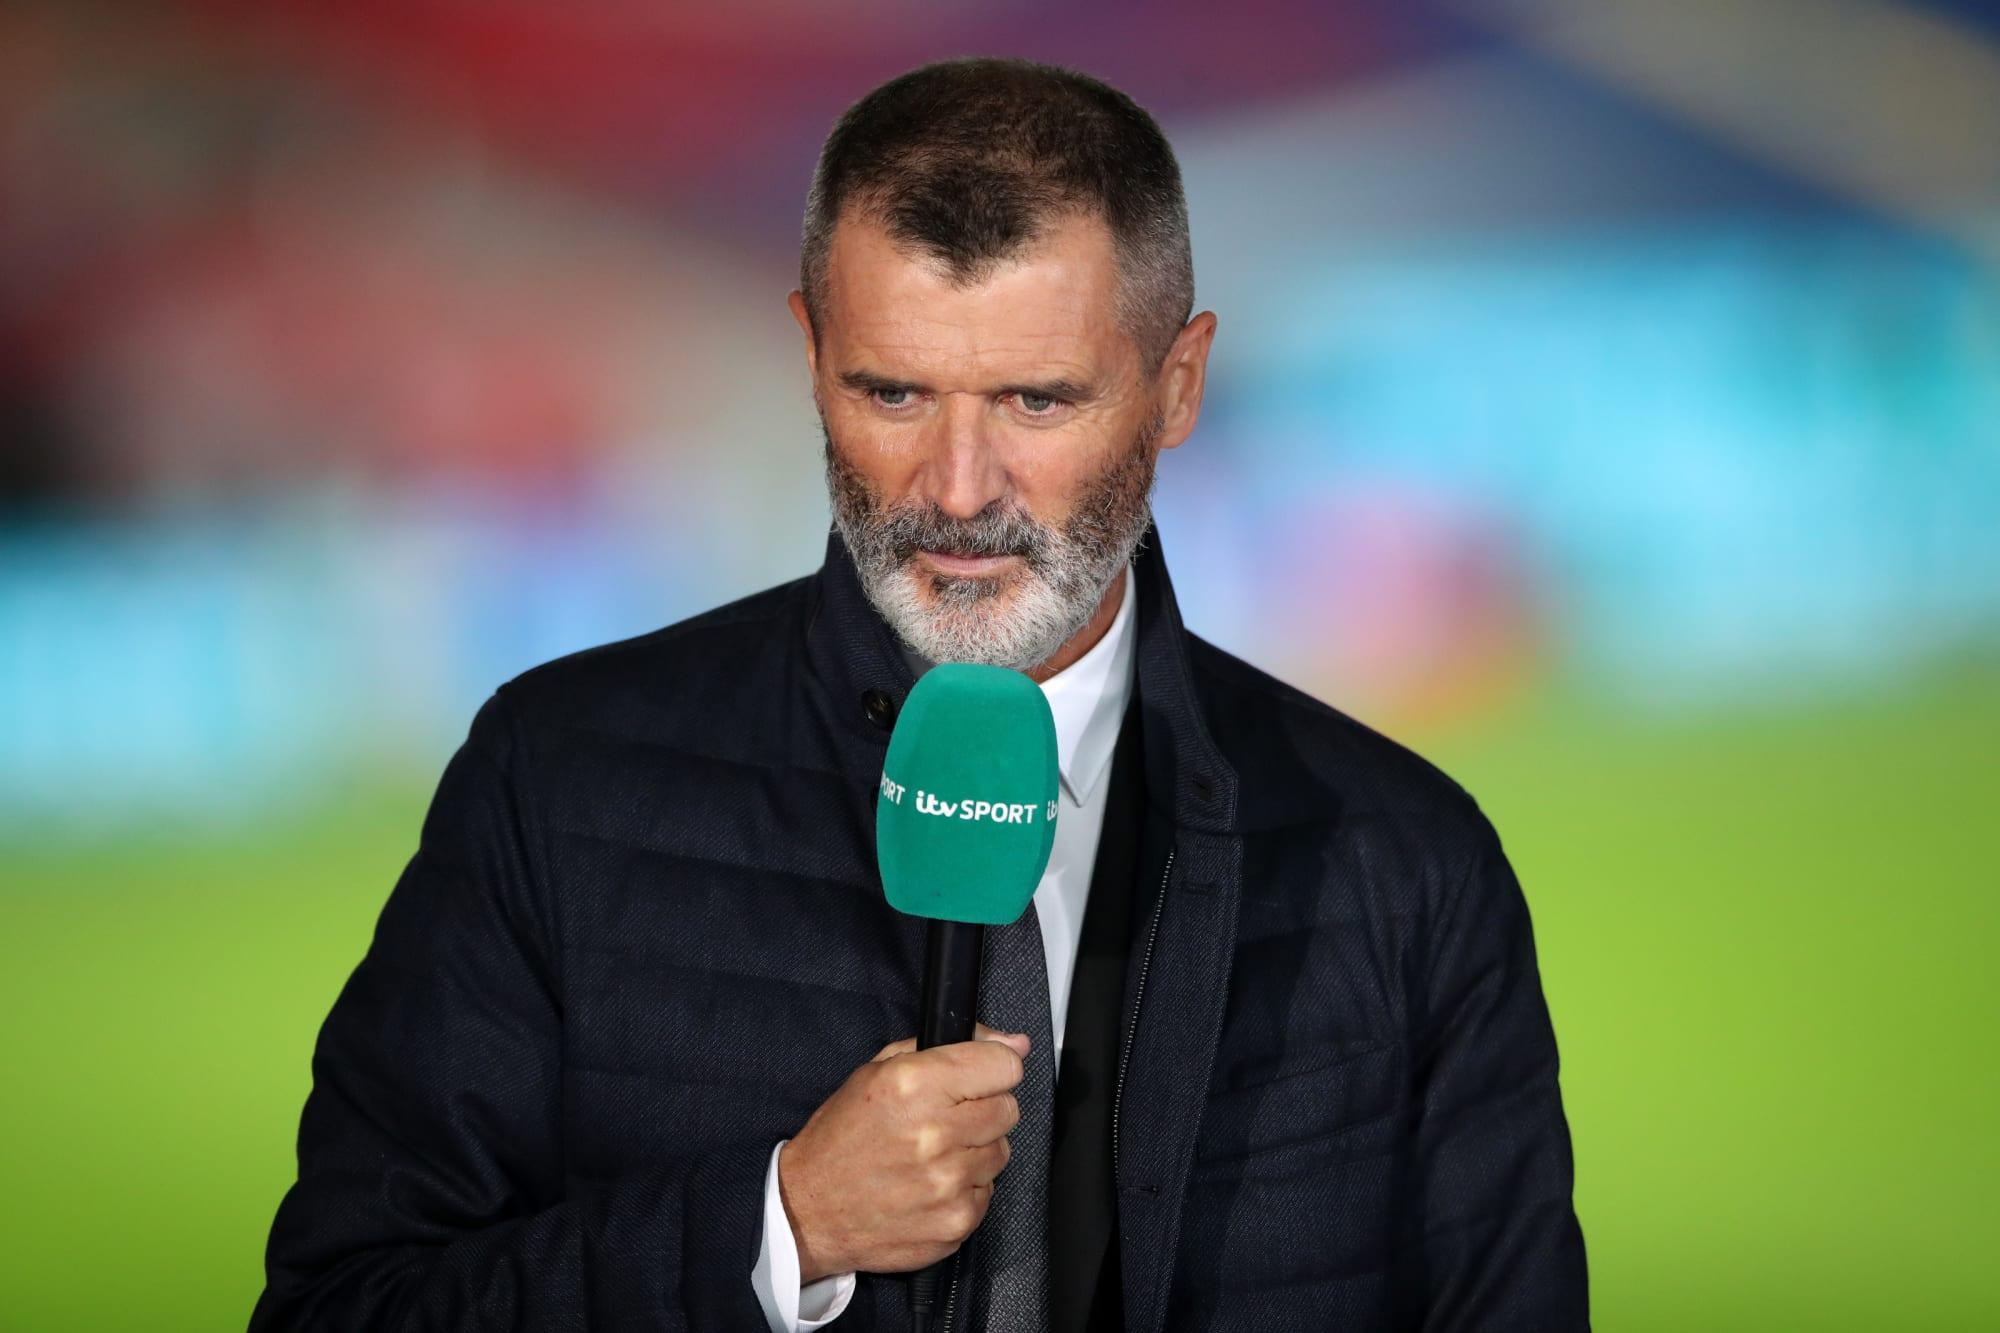 'Huge Signing' – Roy Keane hails Manchester United star